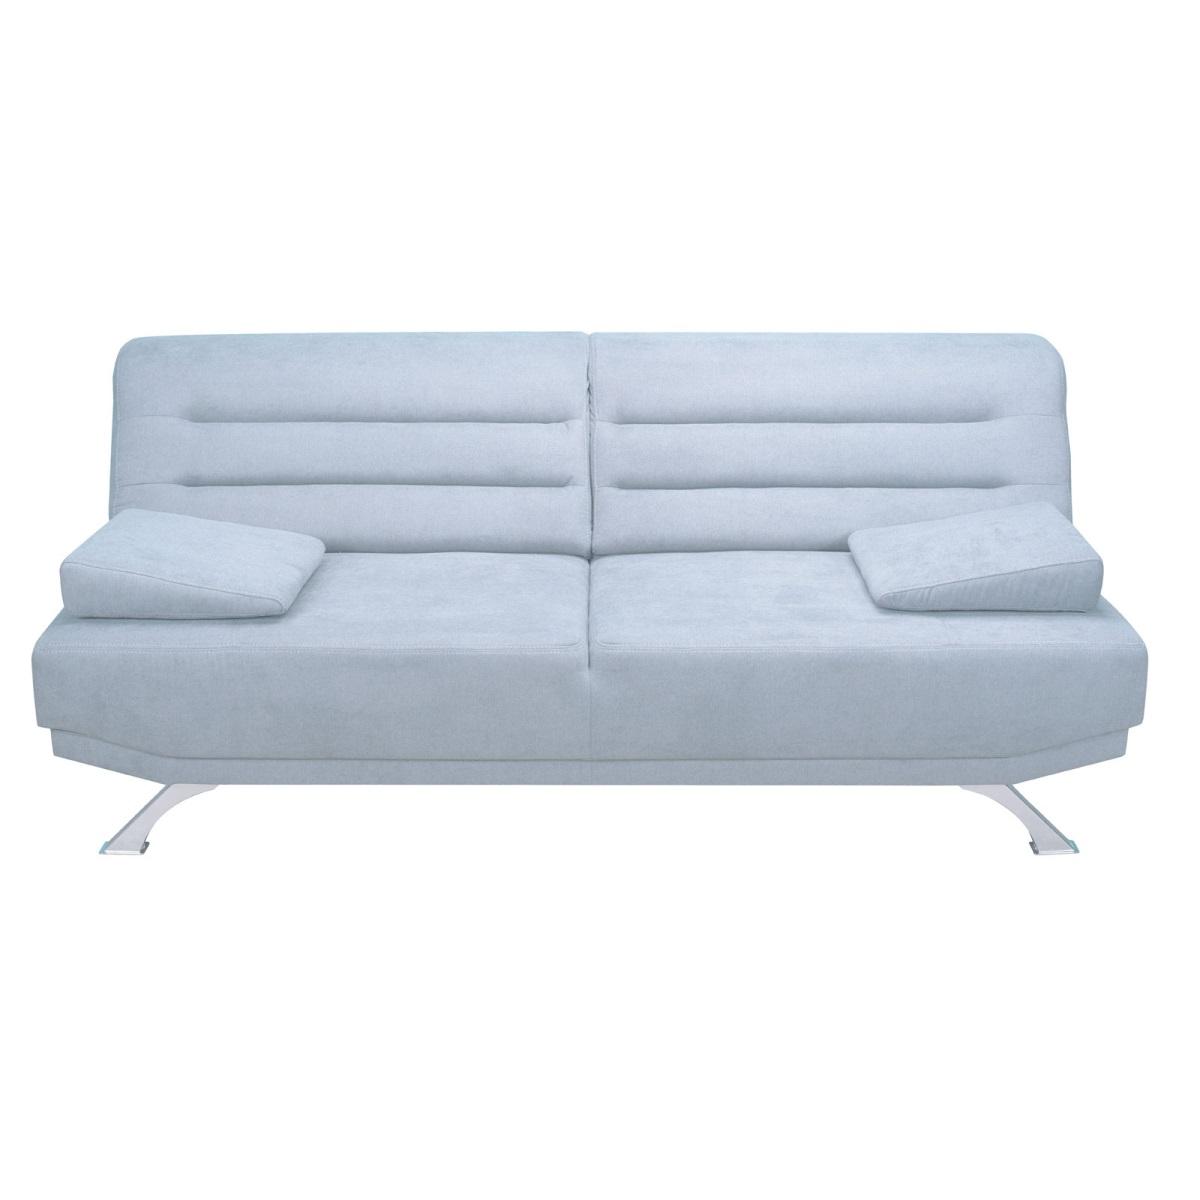 Full Size of Sofa 2 Sitzer Irena 192 96 Cm Stoffbezug Hellgrau Alcantara Bett 120 Breit Ecksofa Garten Schilling Mit Led Xxl Günstig Marken Bunt 3 1 Weißes Cassina Sofa Sofa Sitzhöhe 55 Cm